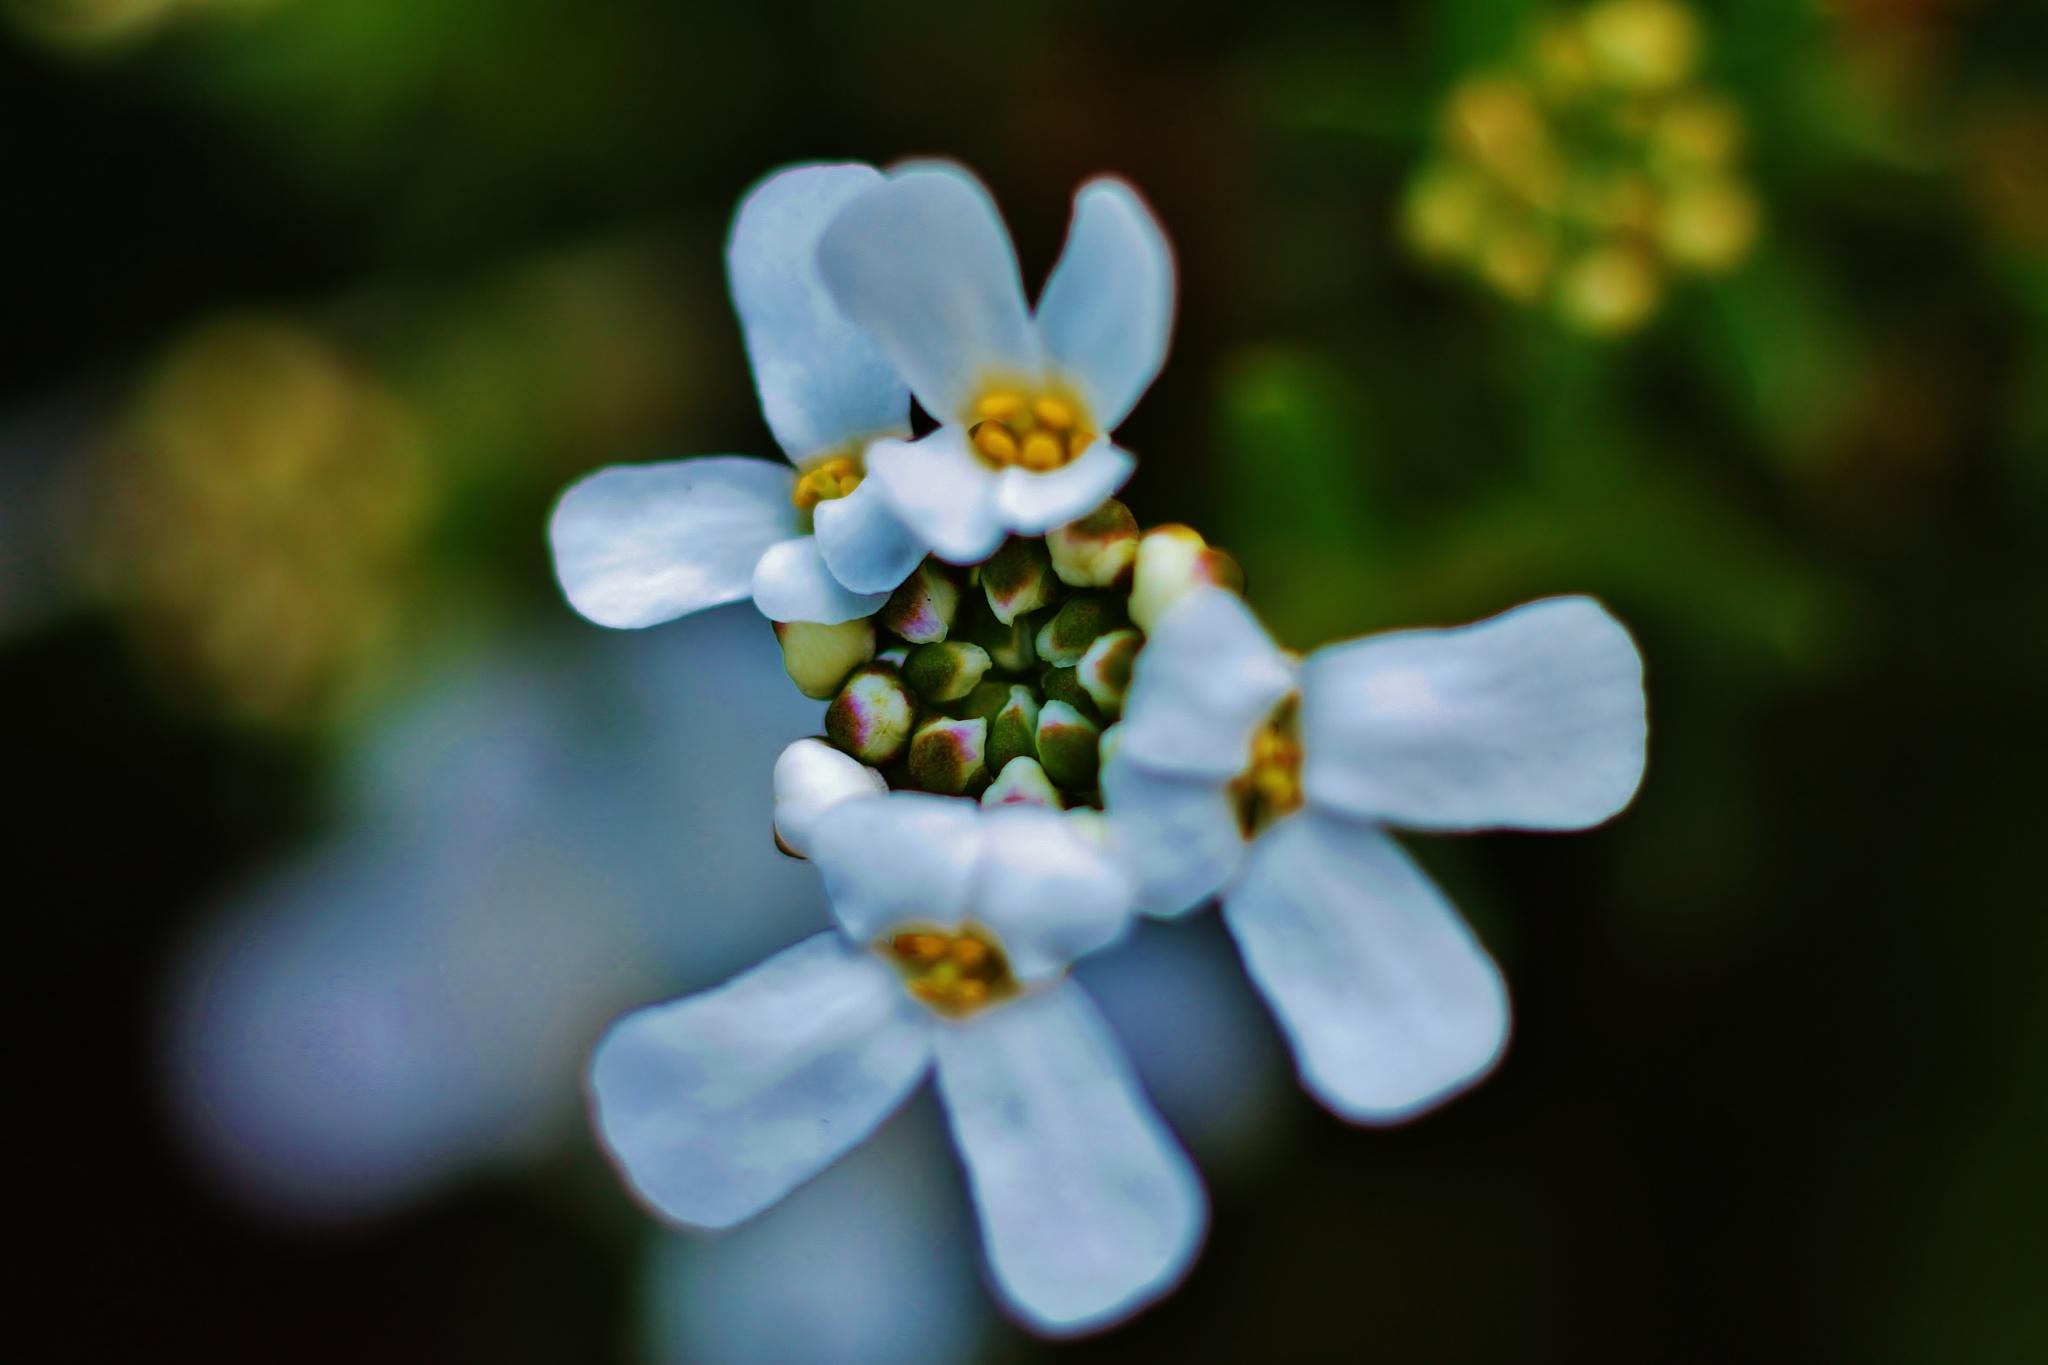 petites fleurs blanche1, by Liborio Drogo